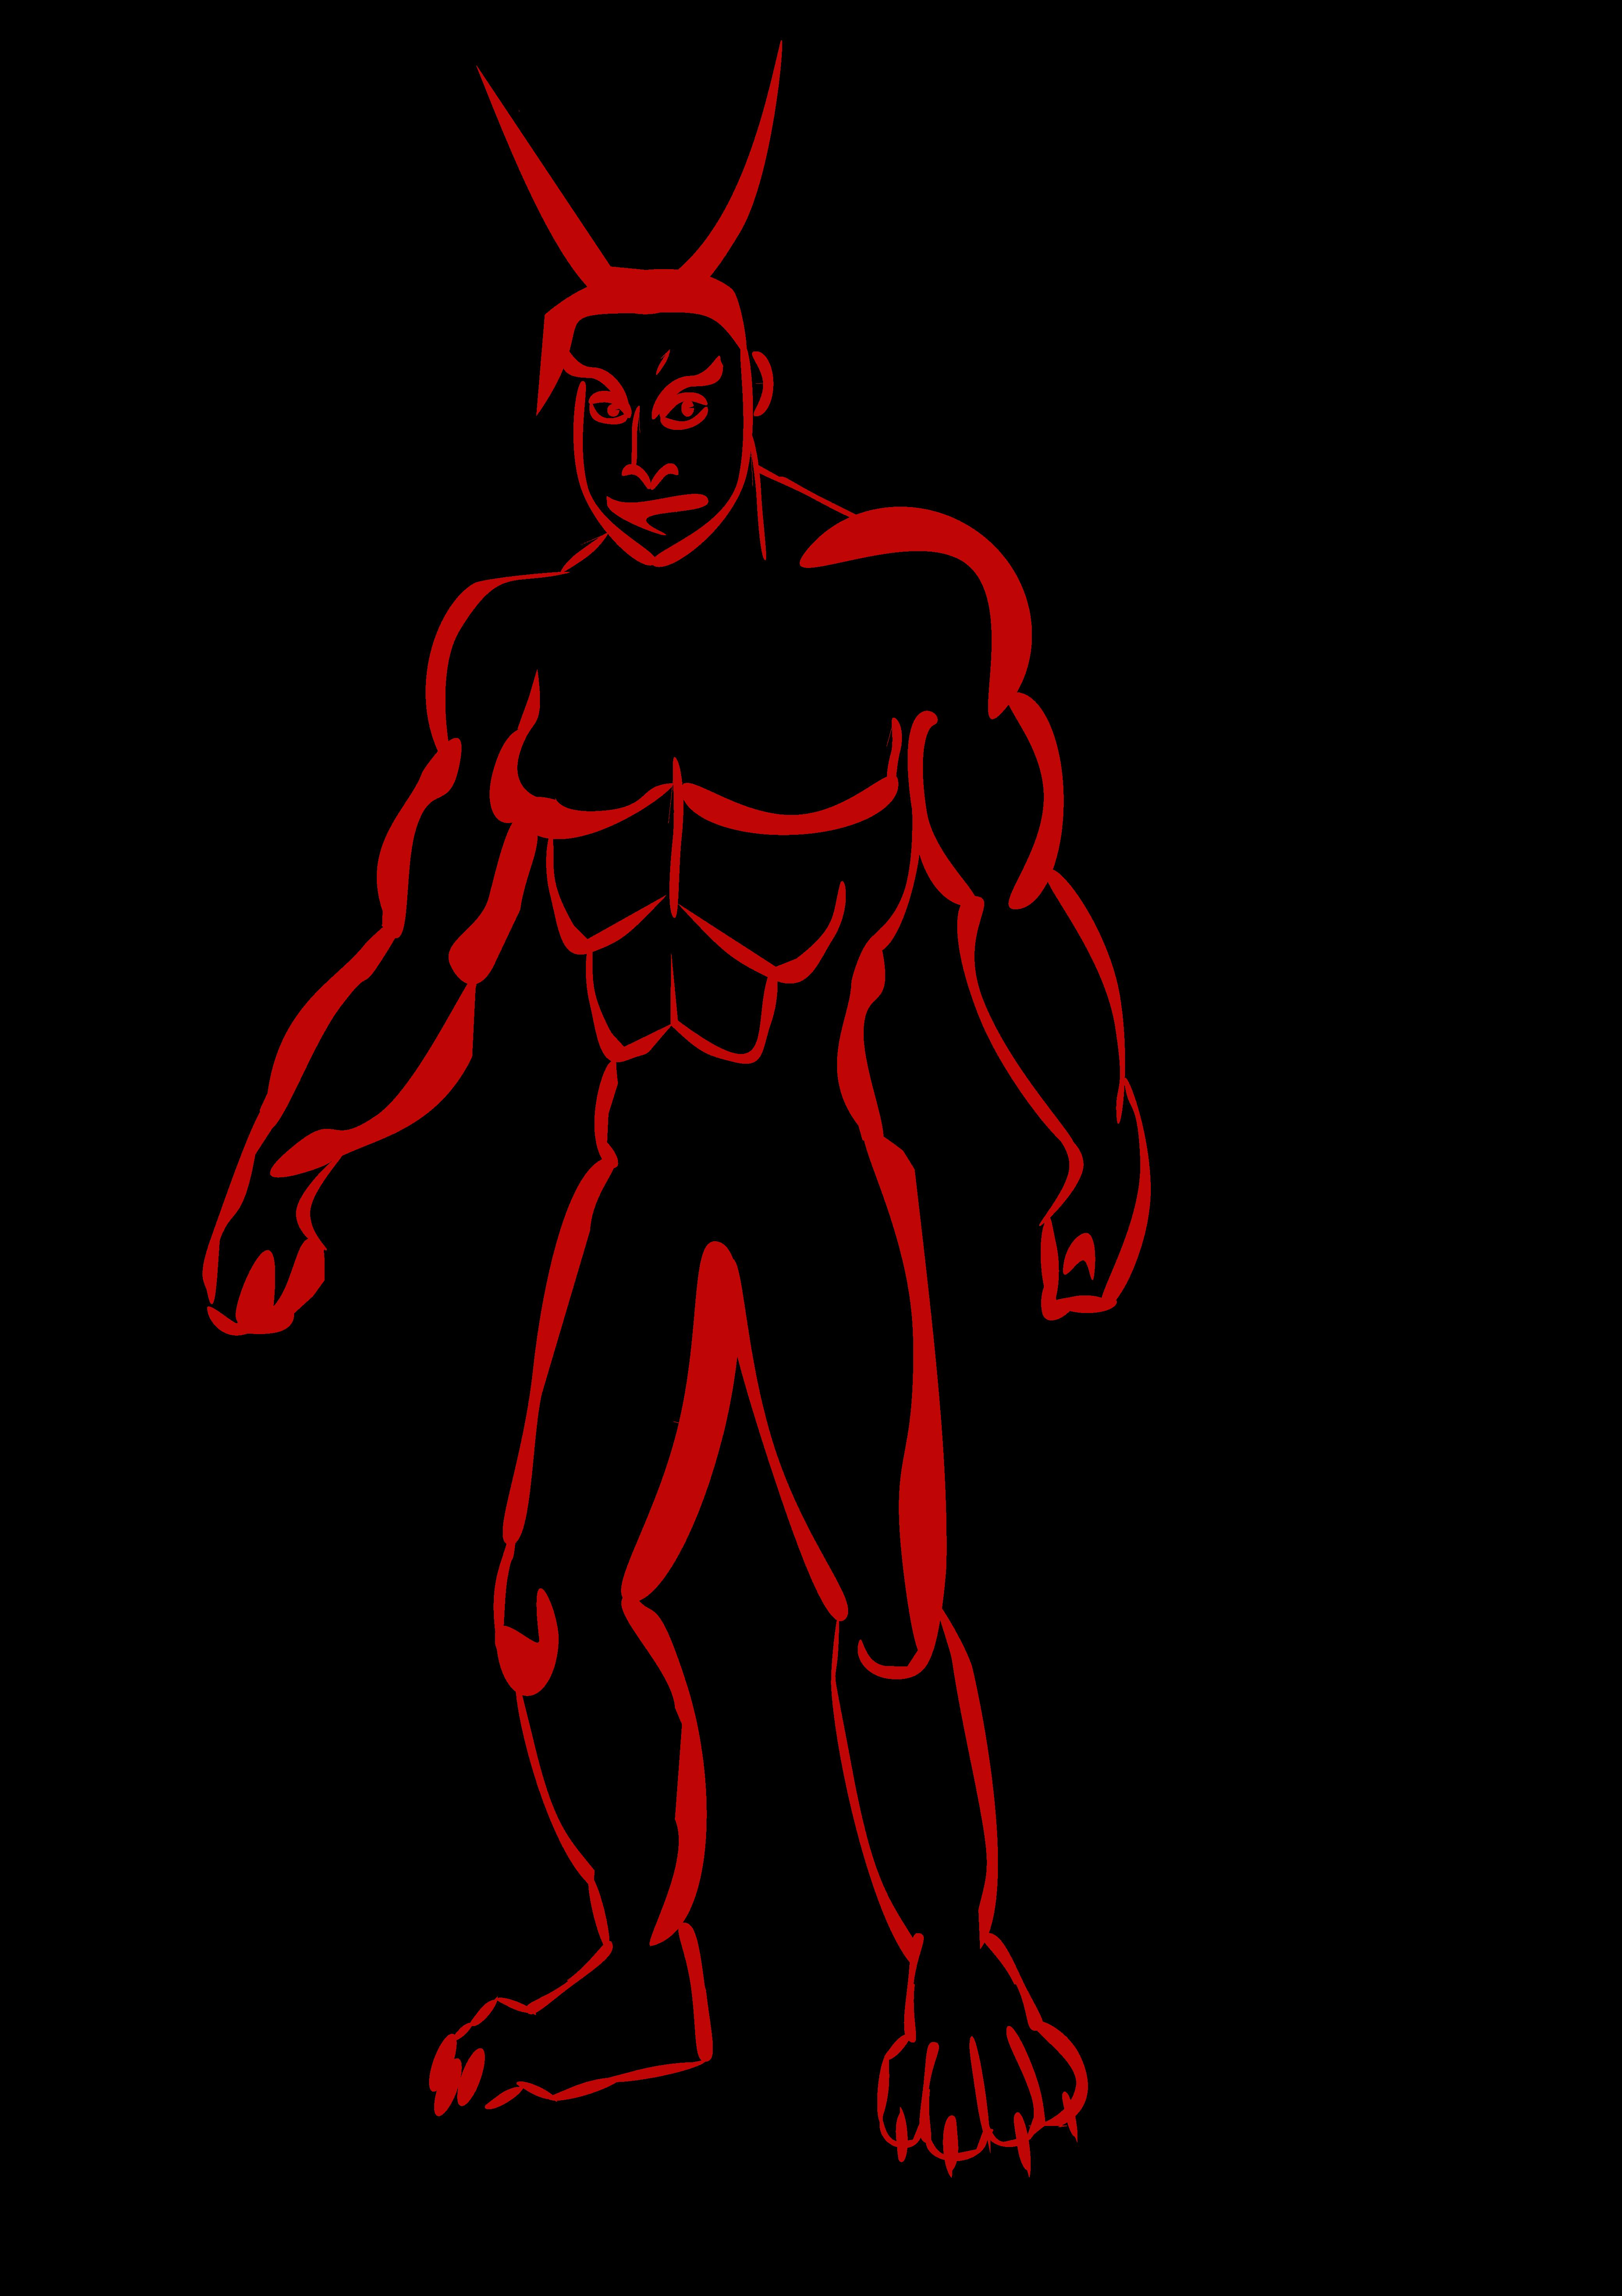 Alkyoneus Riese Titan